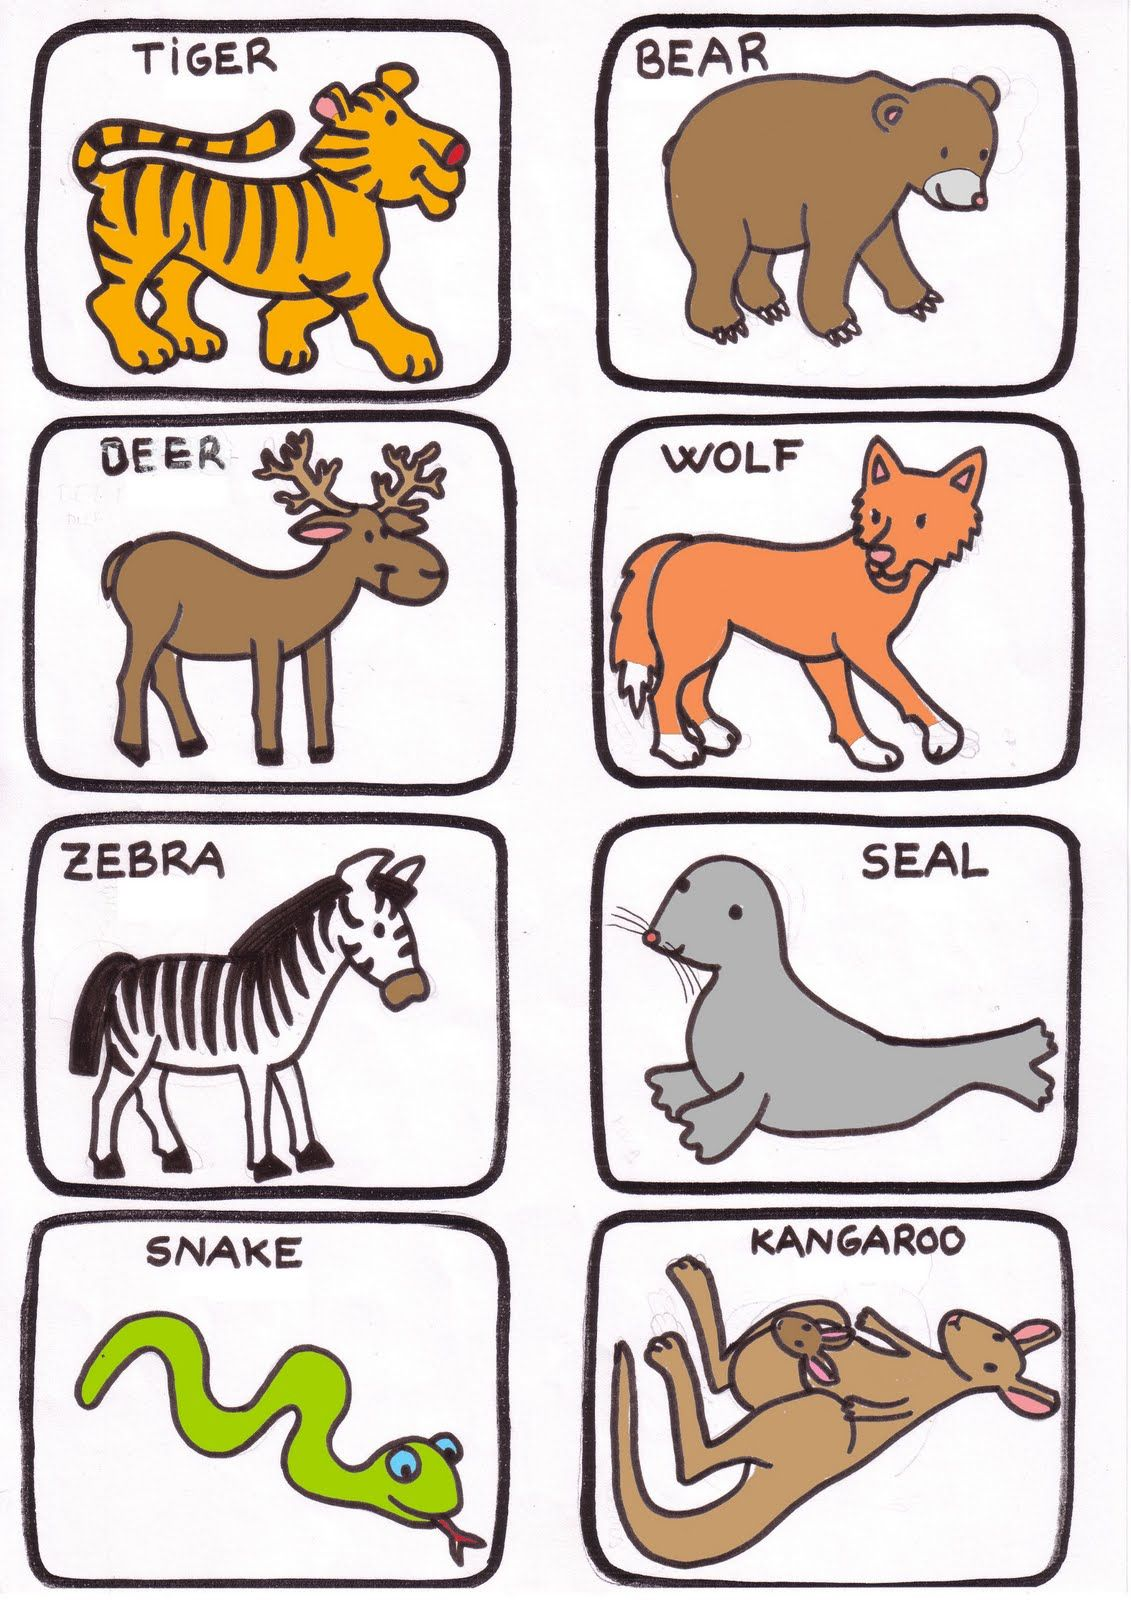 Animales Salvajes En Ingles